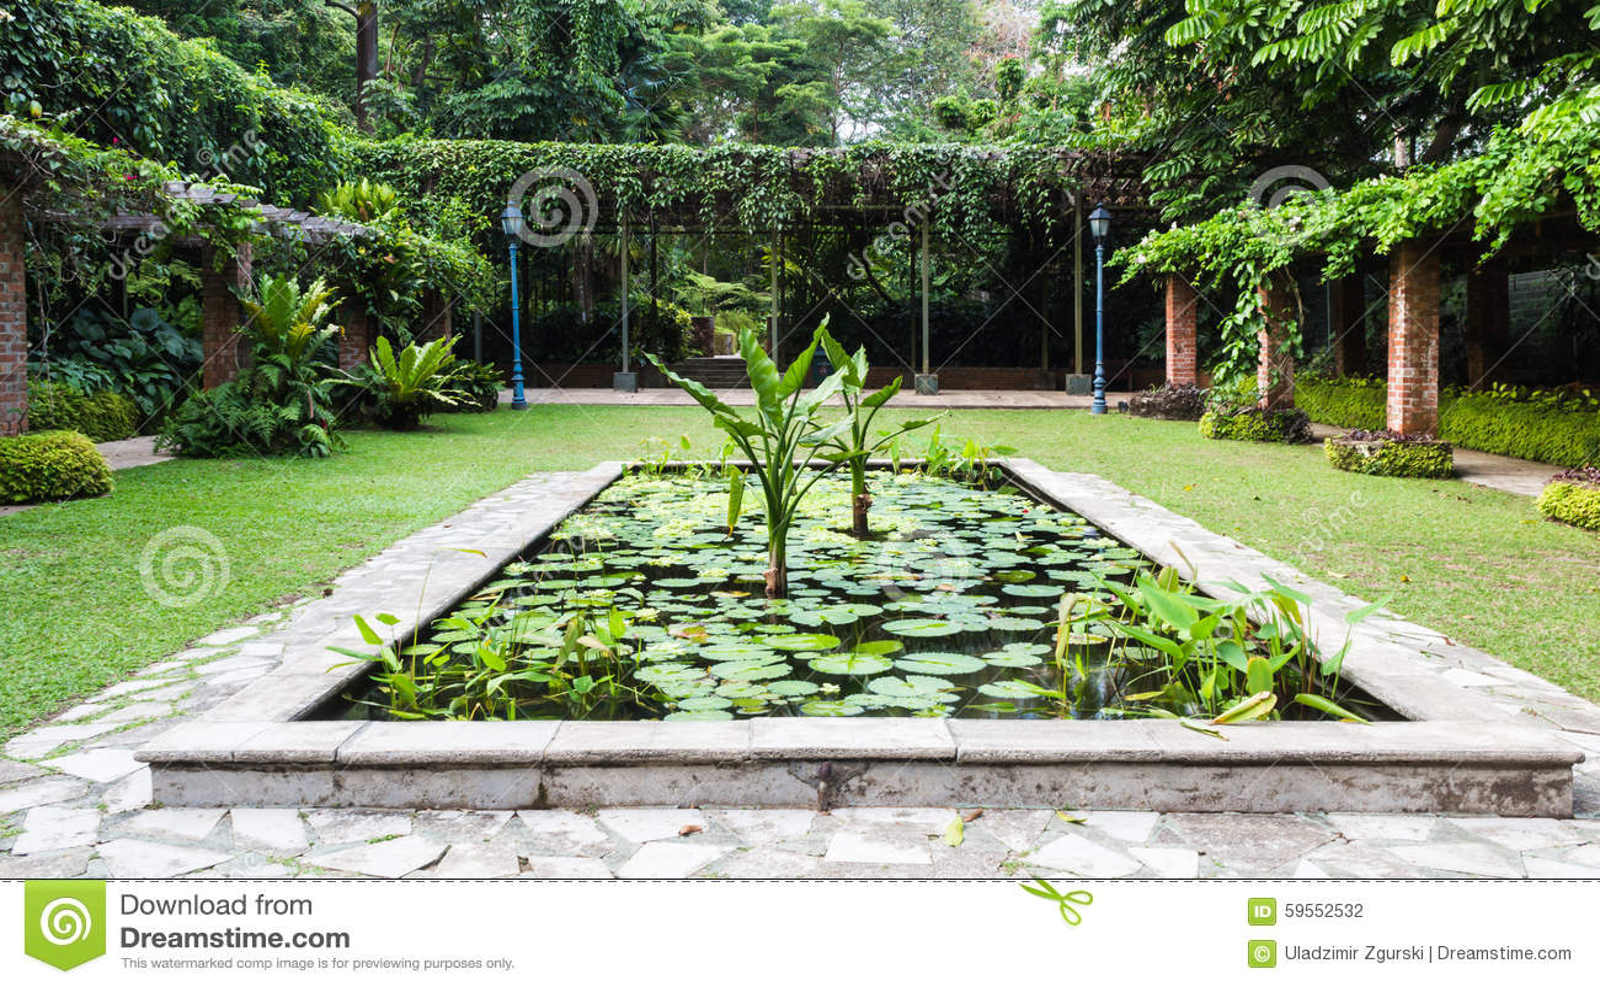 Decorative pond in the botanic garden stock photo image for Decorative ponds